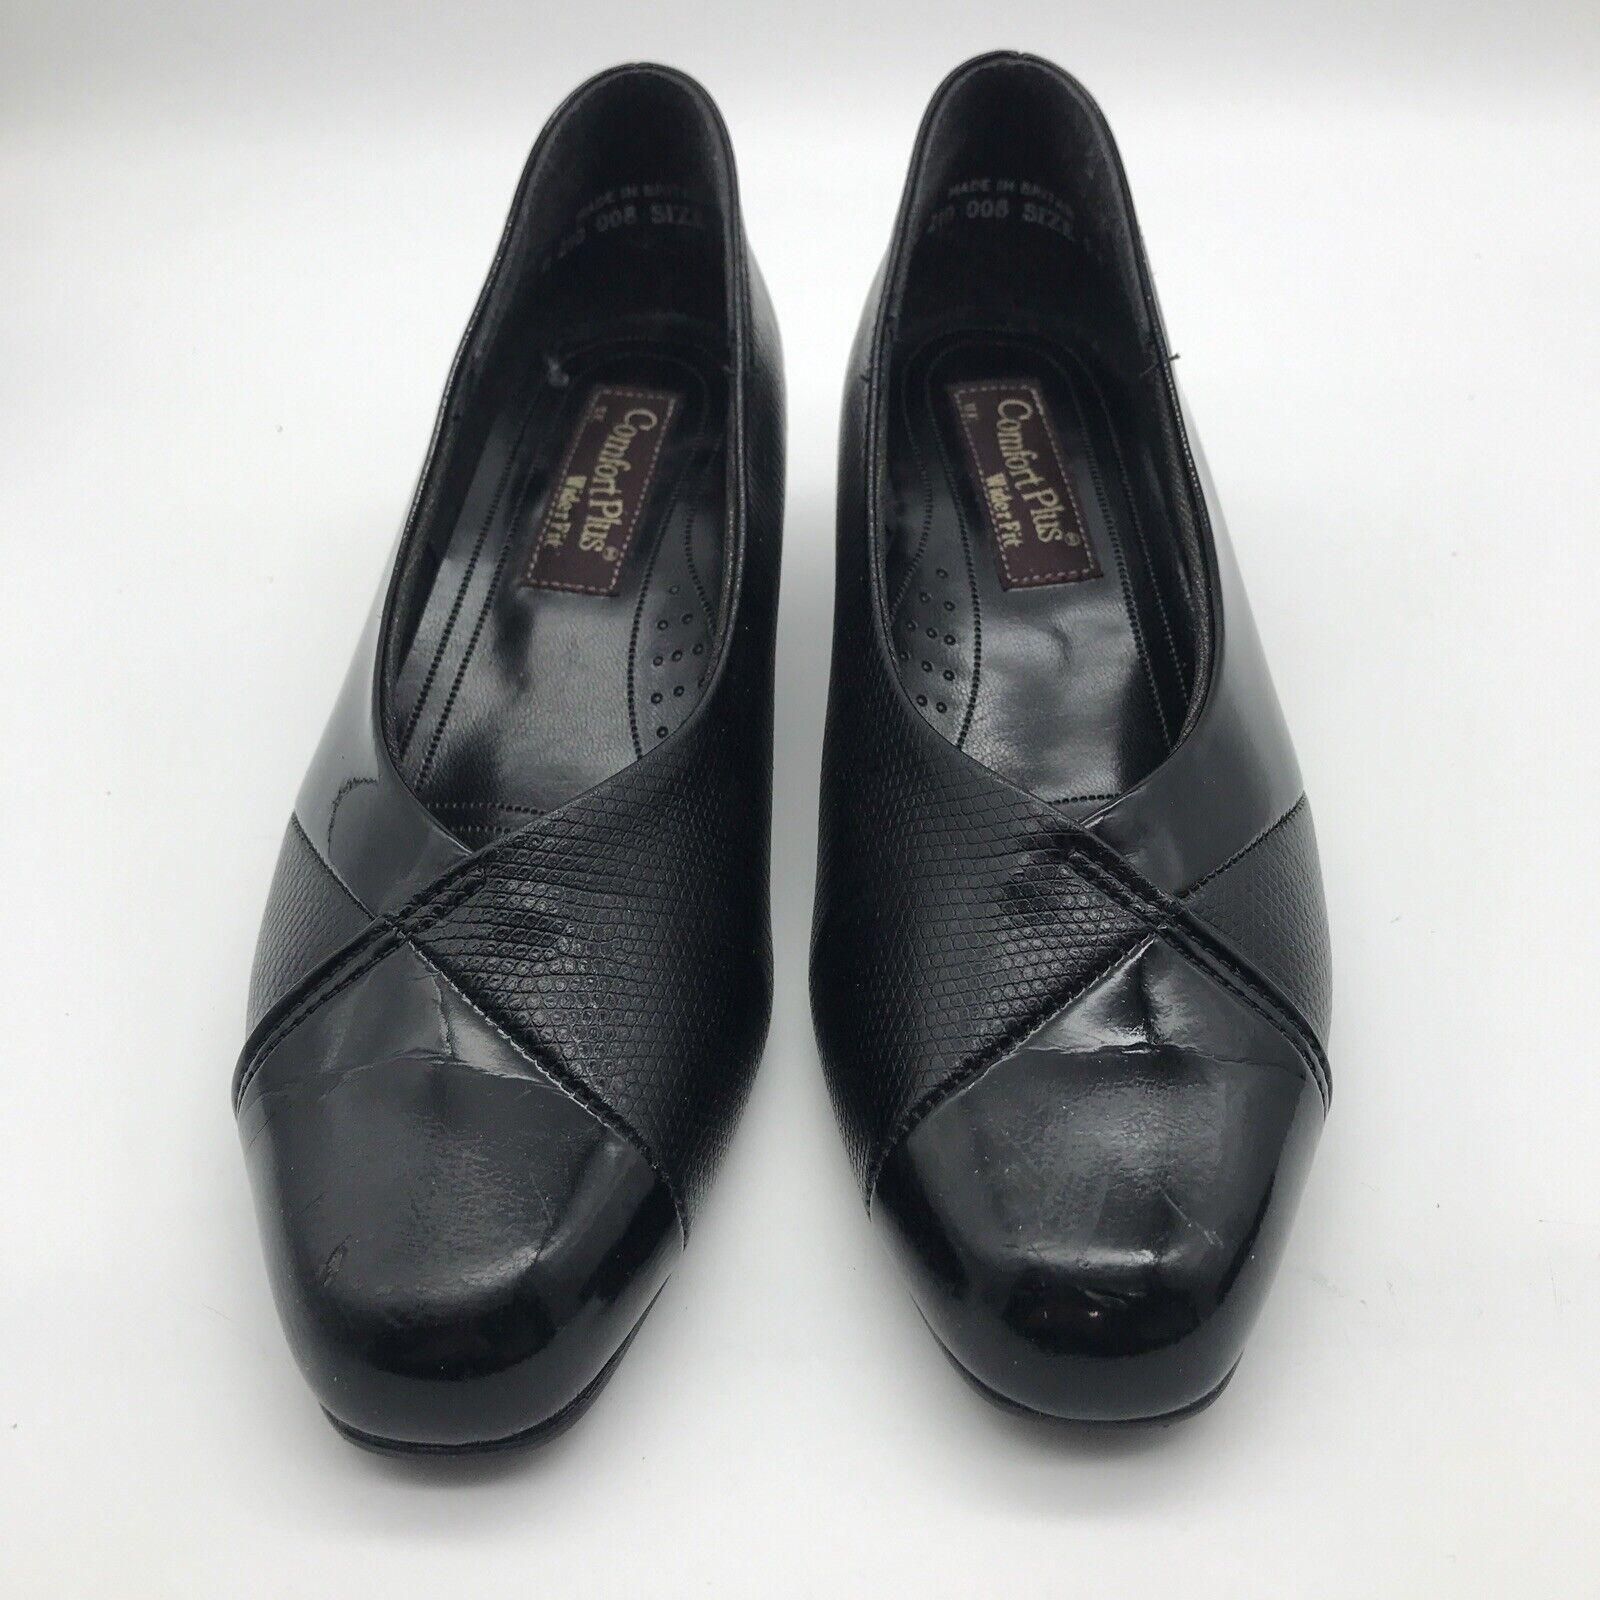 Comfort Plus NATALIE Black Patent Leather Wide Fitting Ladies Shoes UK 5.5 EU 39